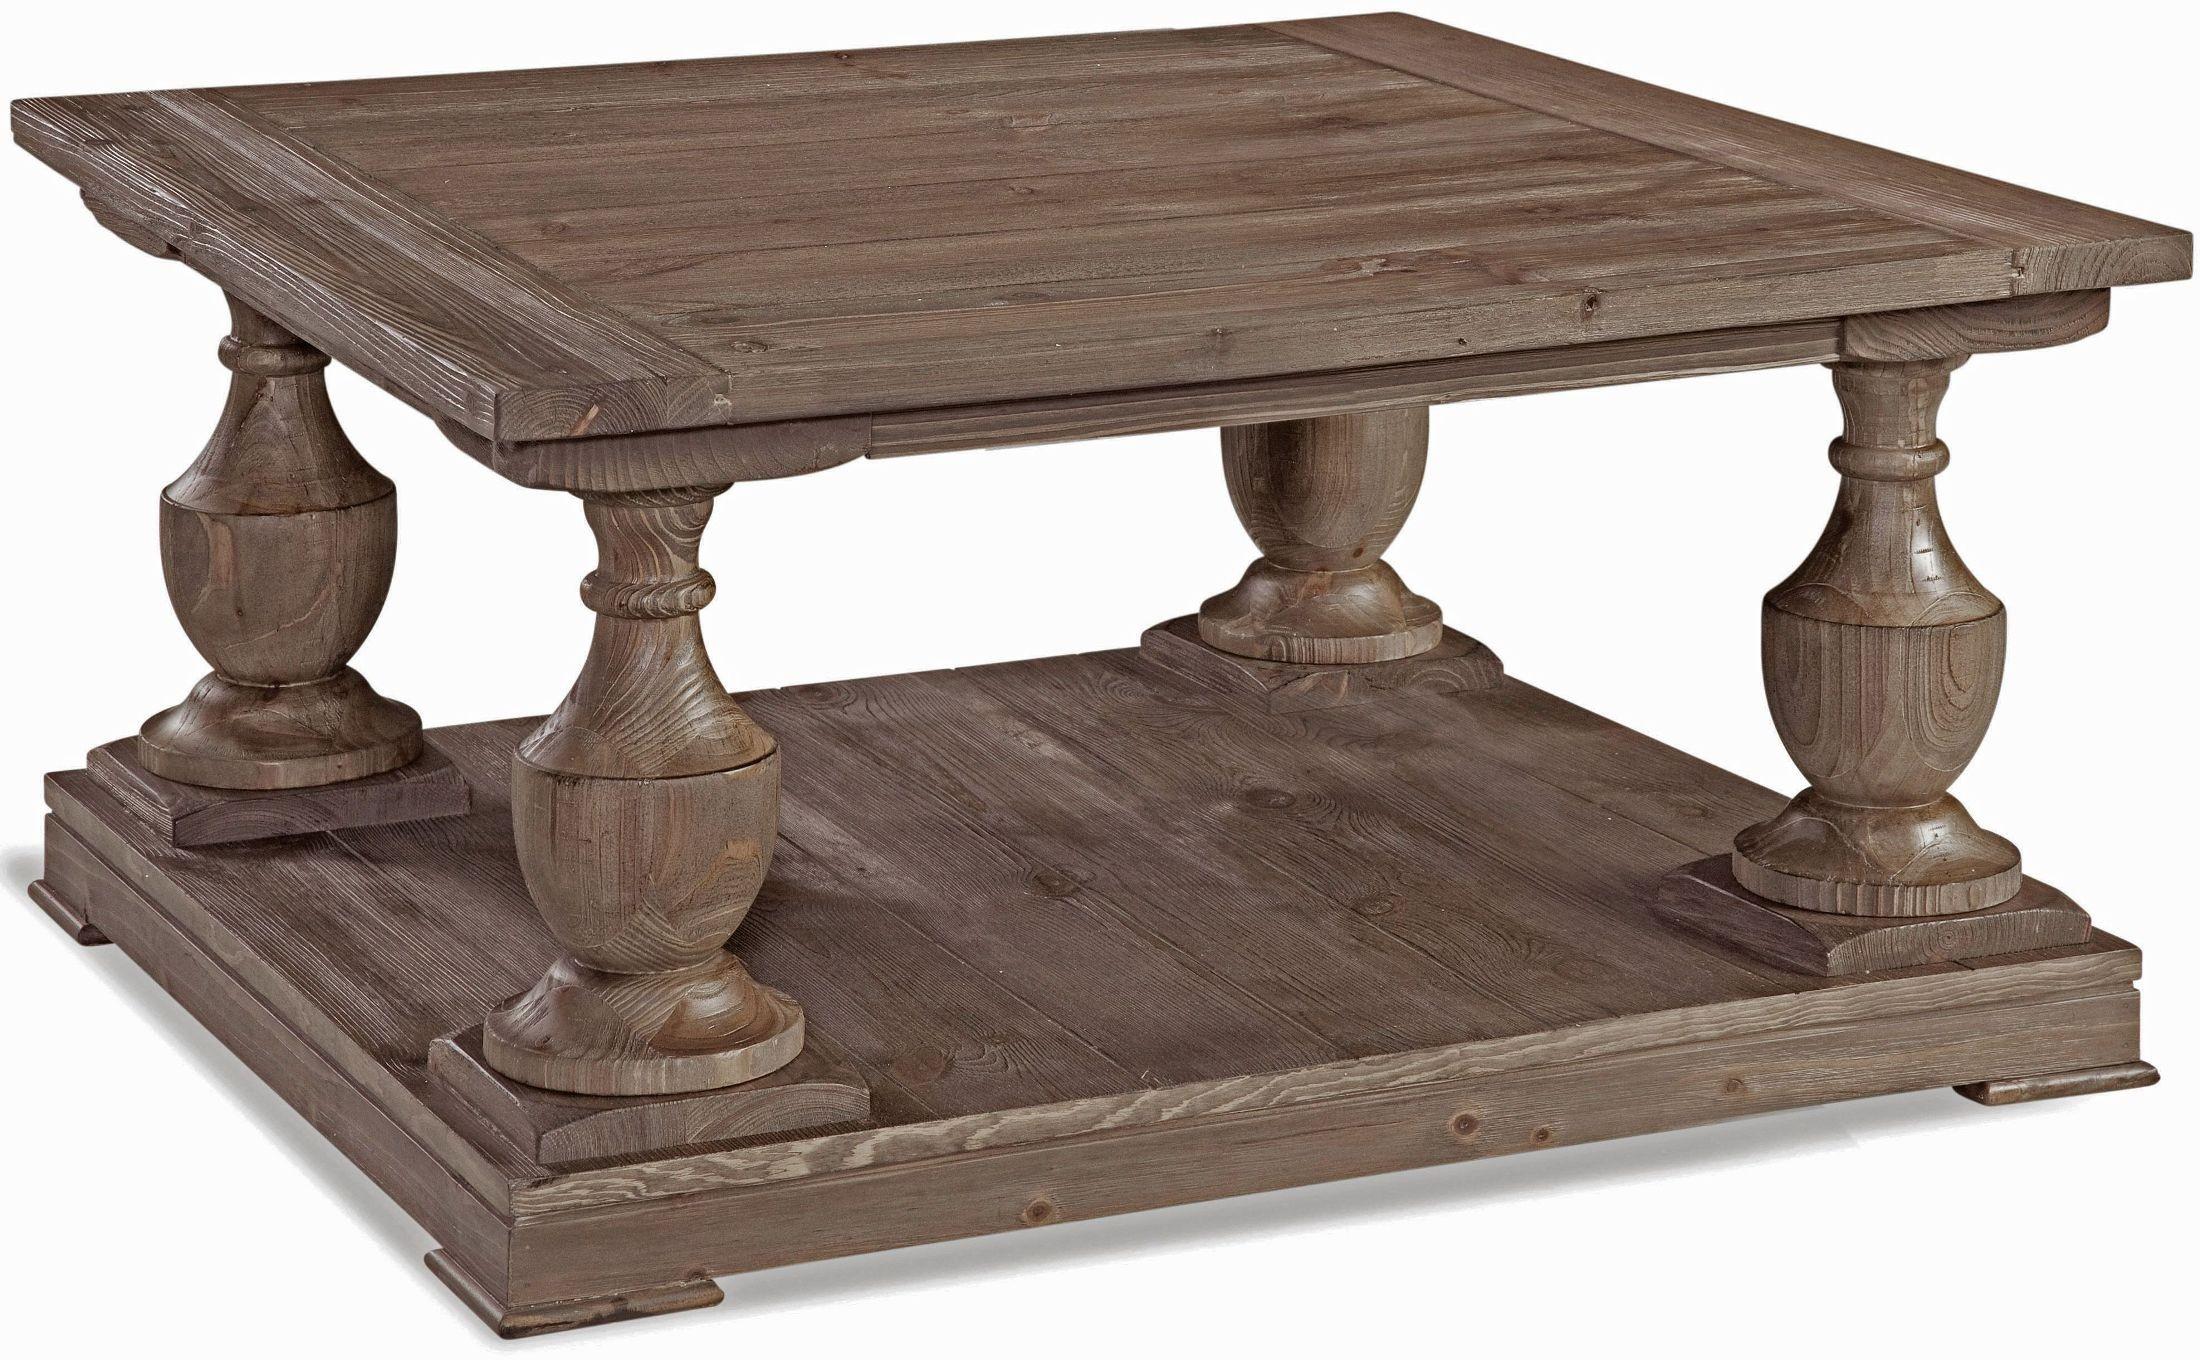 Hitchcock smoked barnwood square cocktail table t2618 for Square cocktail table